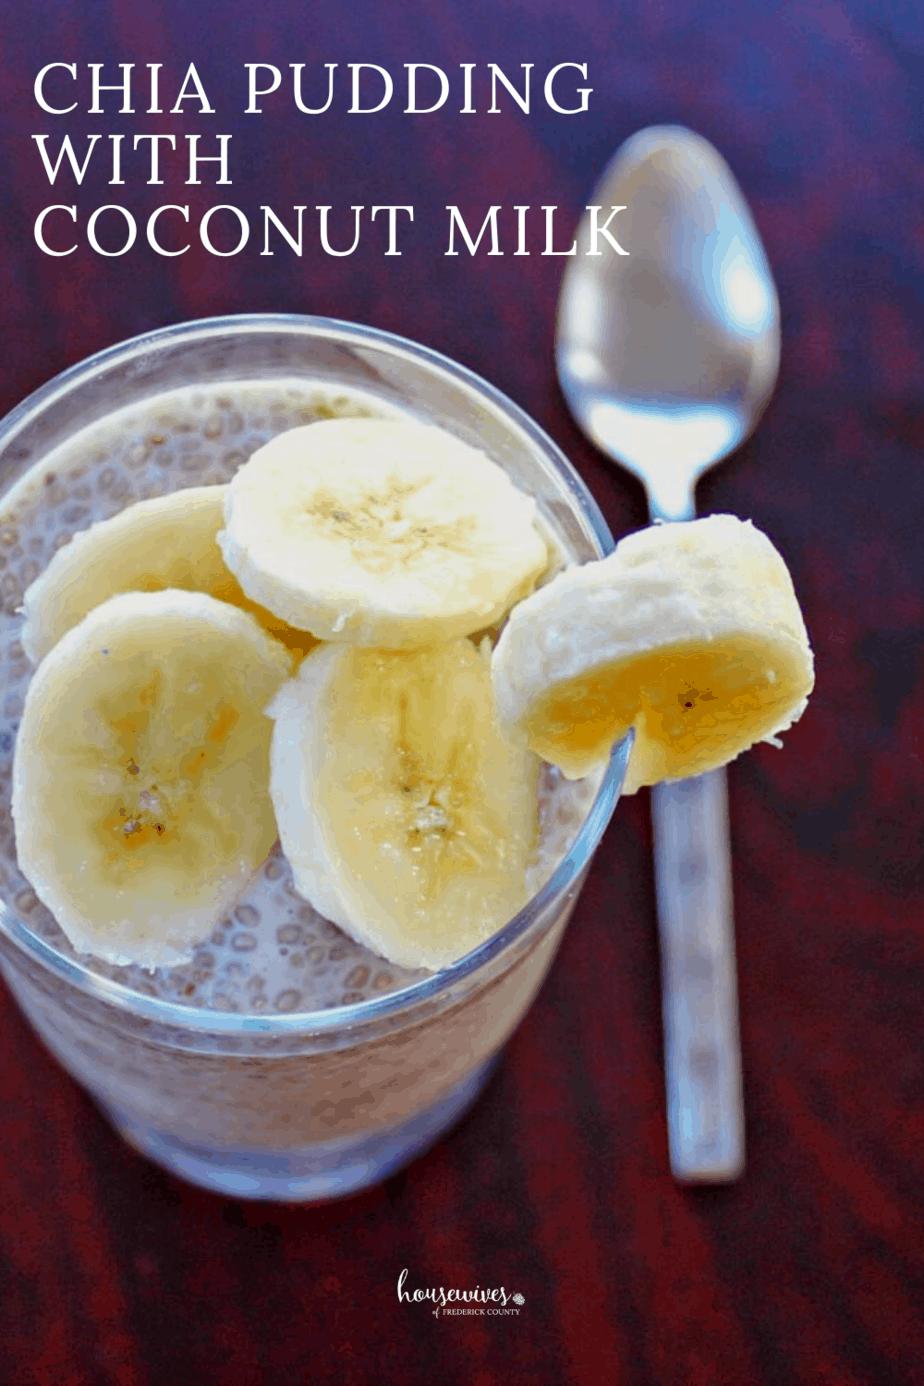 Chia Pudding with Coconut Milk - 3 WW SmartPoints